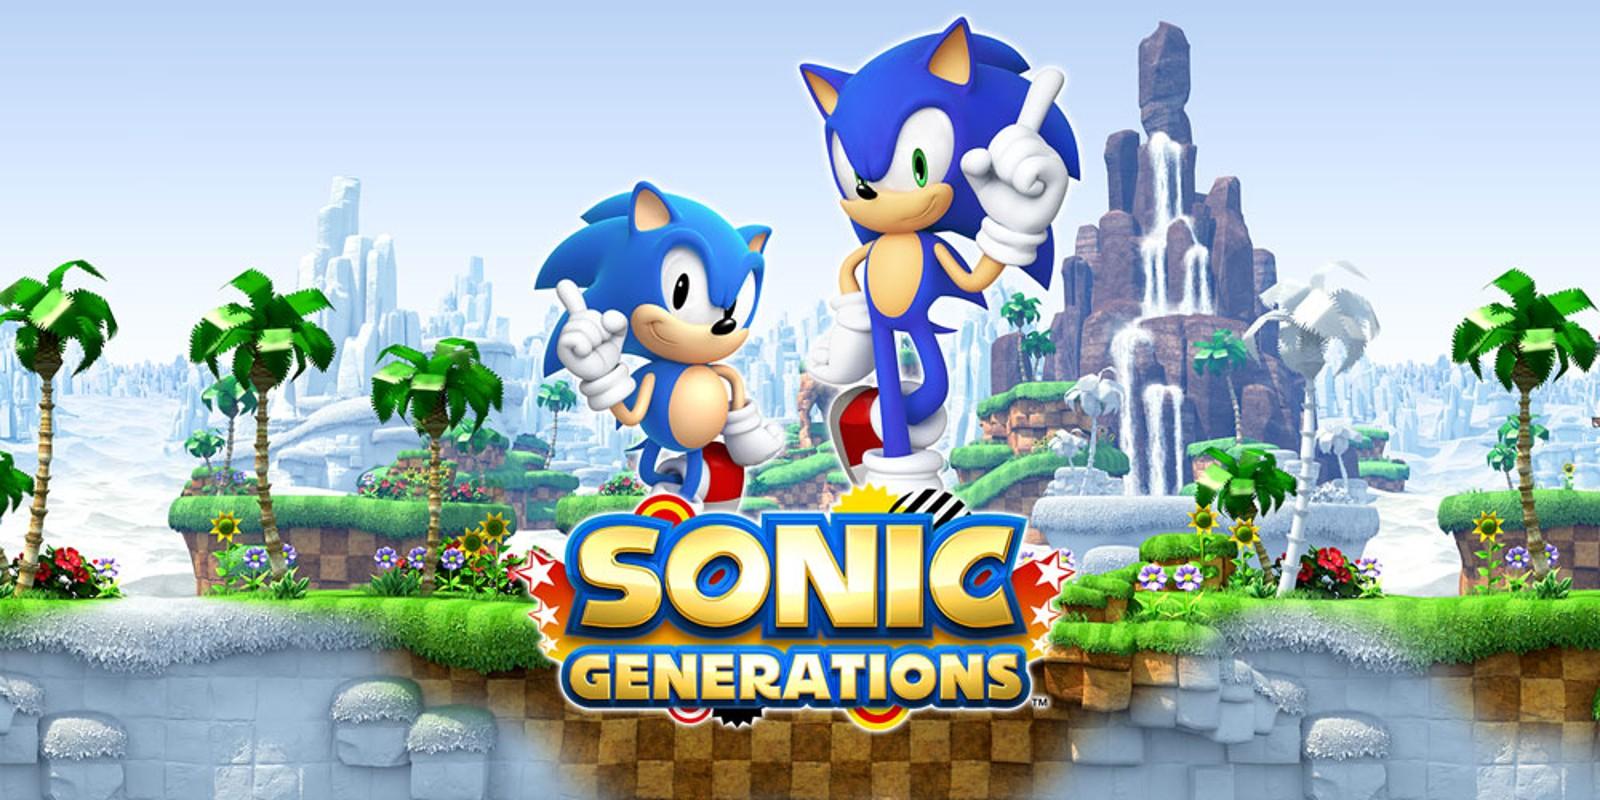 Super Metroid Hd Wallpaper Sonic Generations Nintendo 3ds Games Nintendo